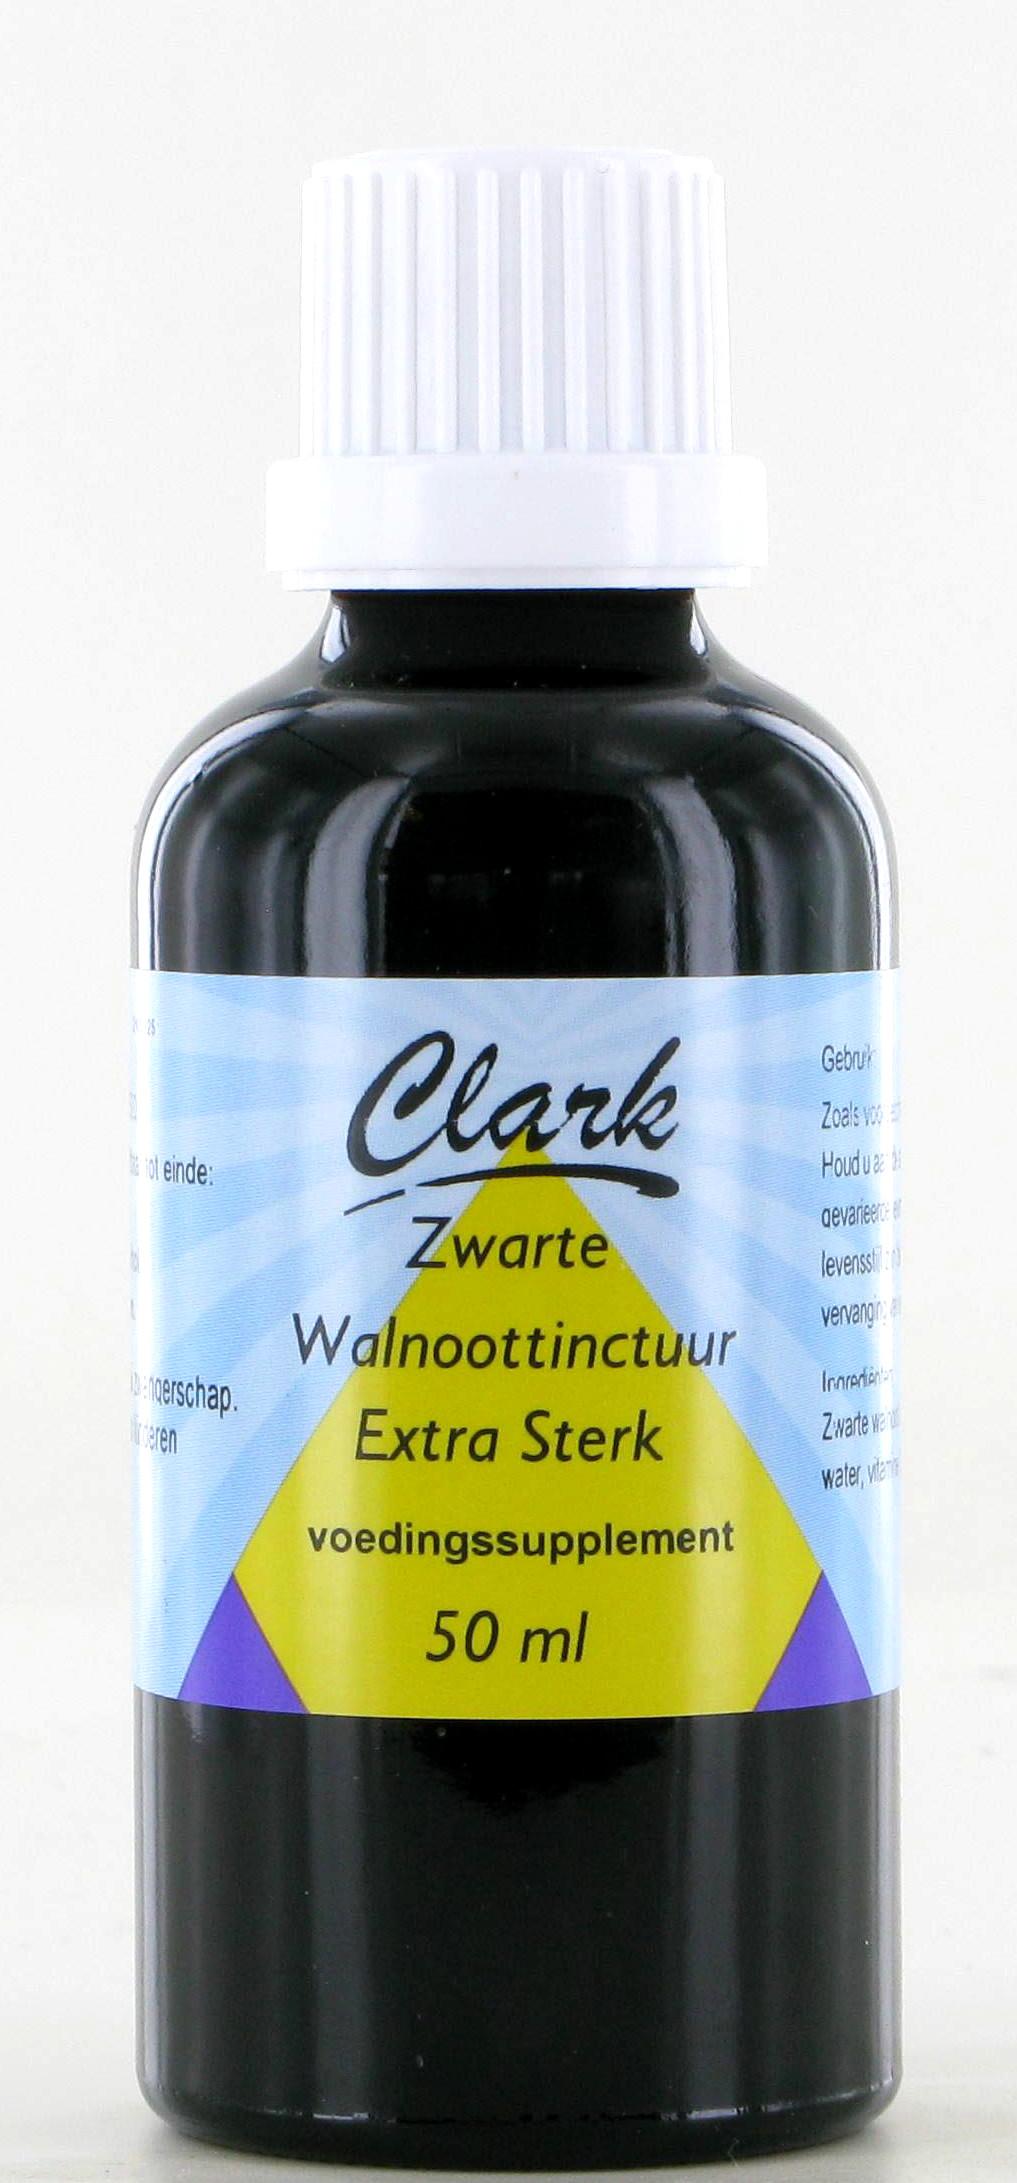 Clark Zwarte Walnoottinctuur extra sterk (50ml)